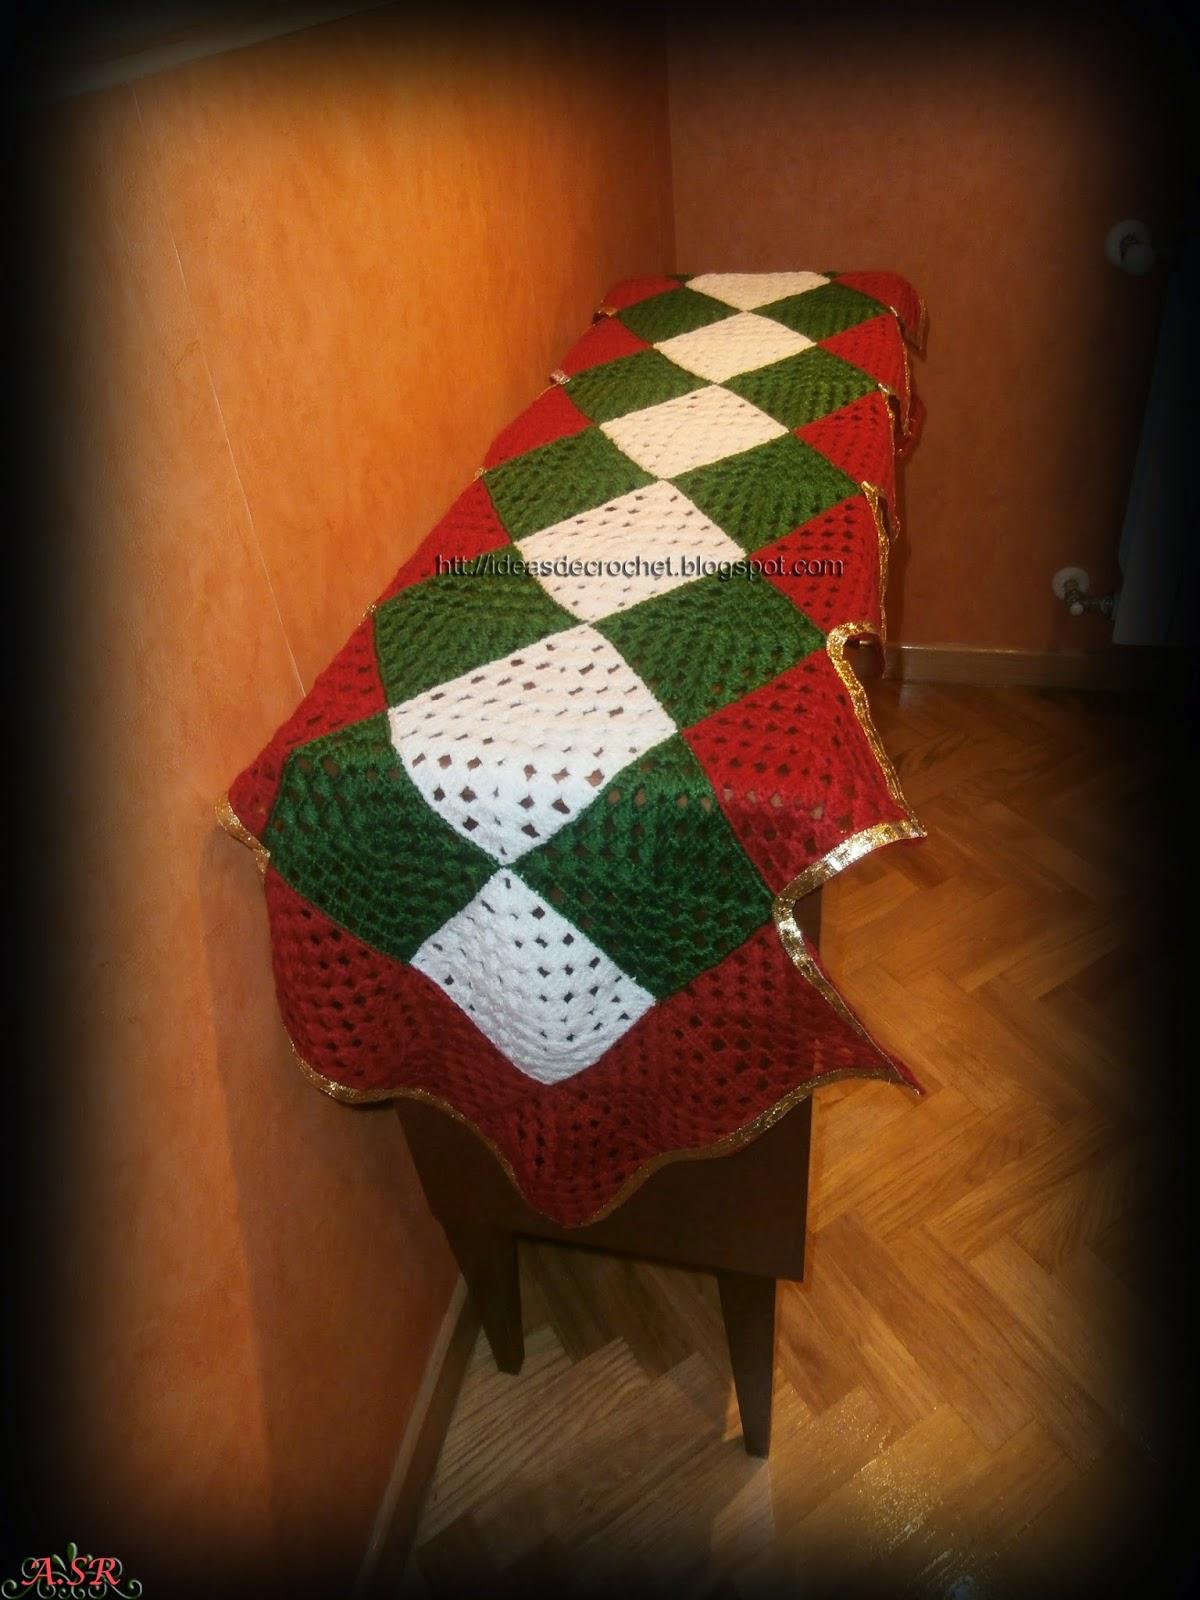 Ideas de crochet noviembre 2014 for Camino de mesa elegante en crochet